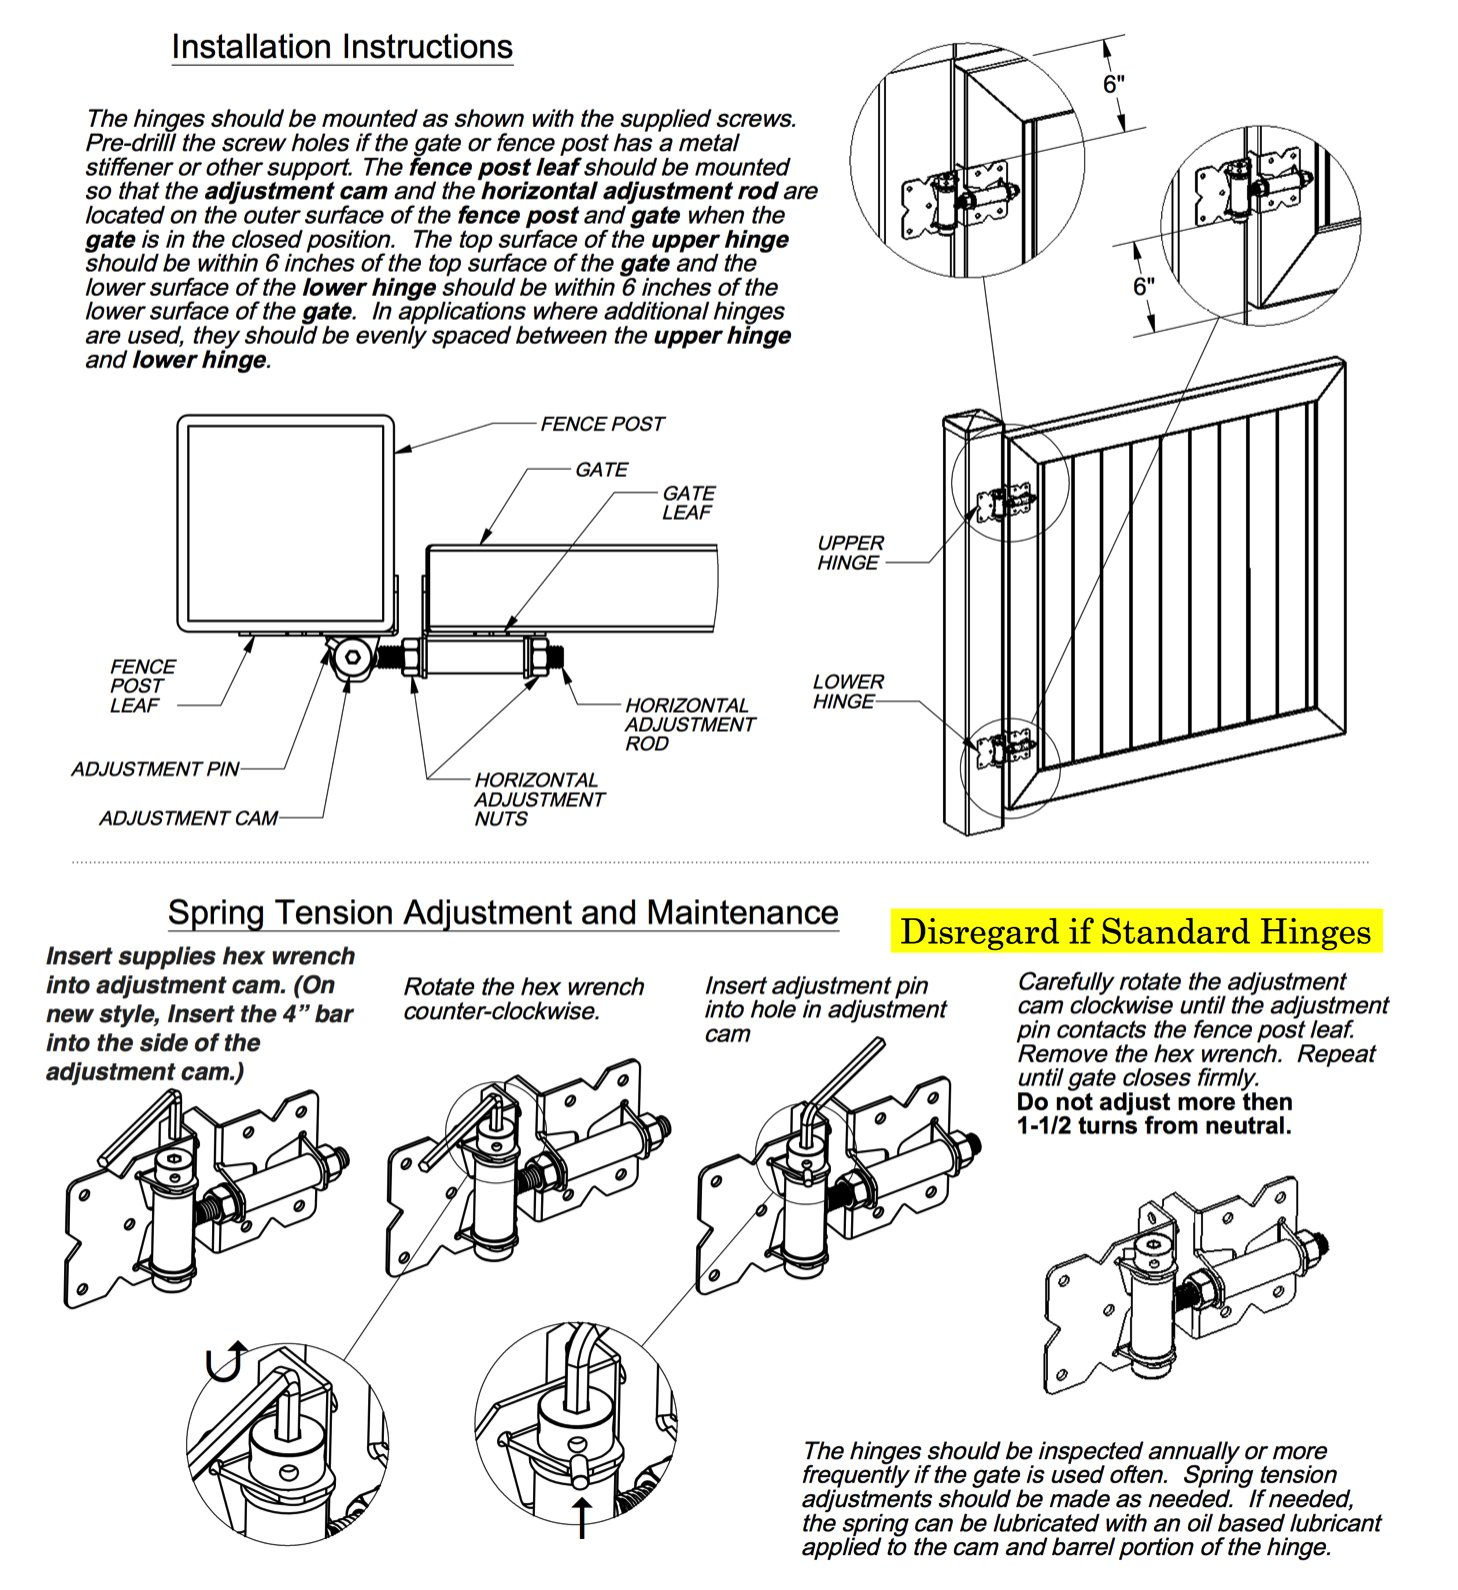 Self Closing Vinyl Fence Gate Single Gate Hardware Kit Black (for Vinyl, PVC etc Fencing) Fence Gate Kit - Single Fence Gate Kit has 2 Hinges and 1 Latch w/Screws (Lockable Both Sides)